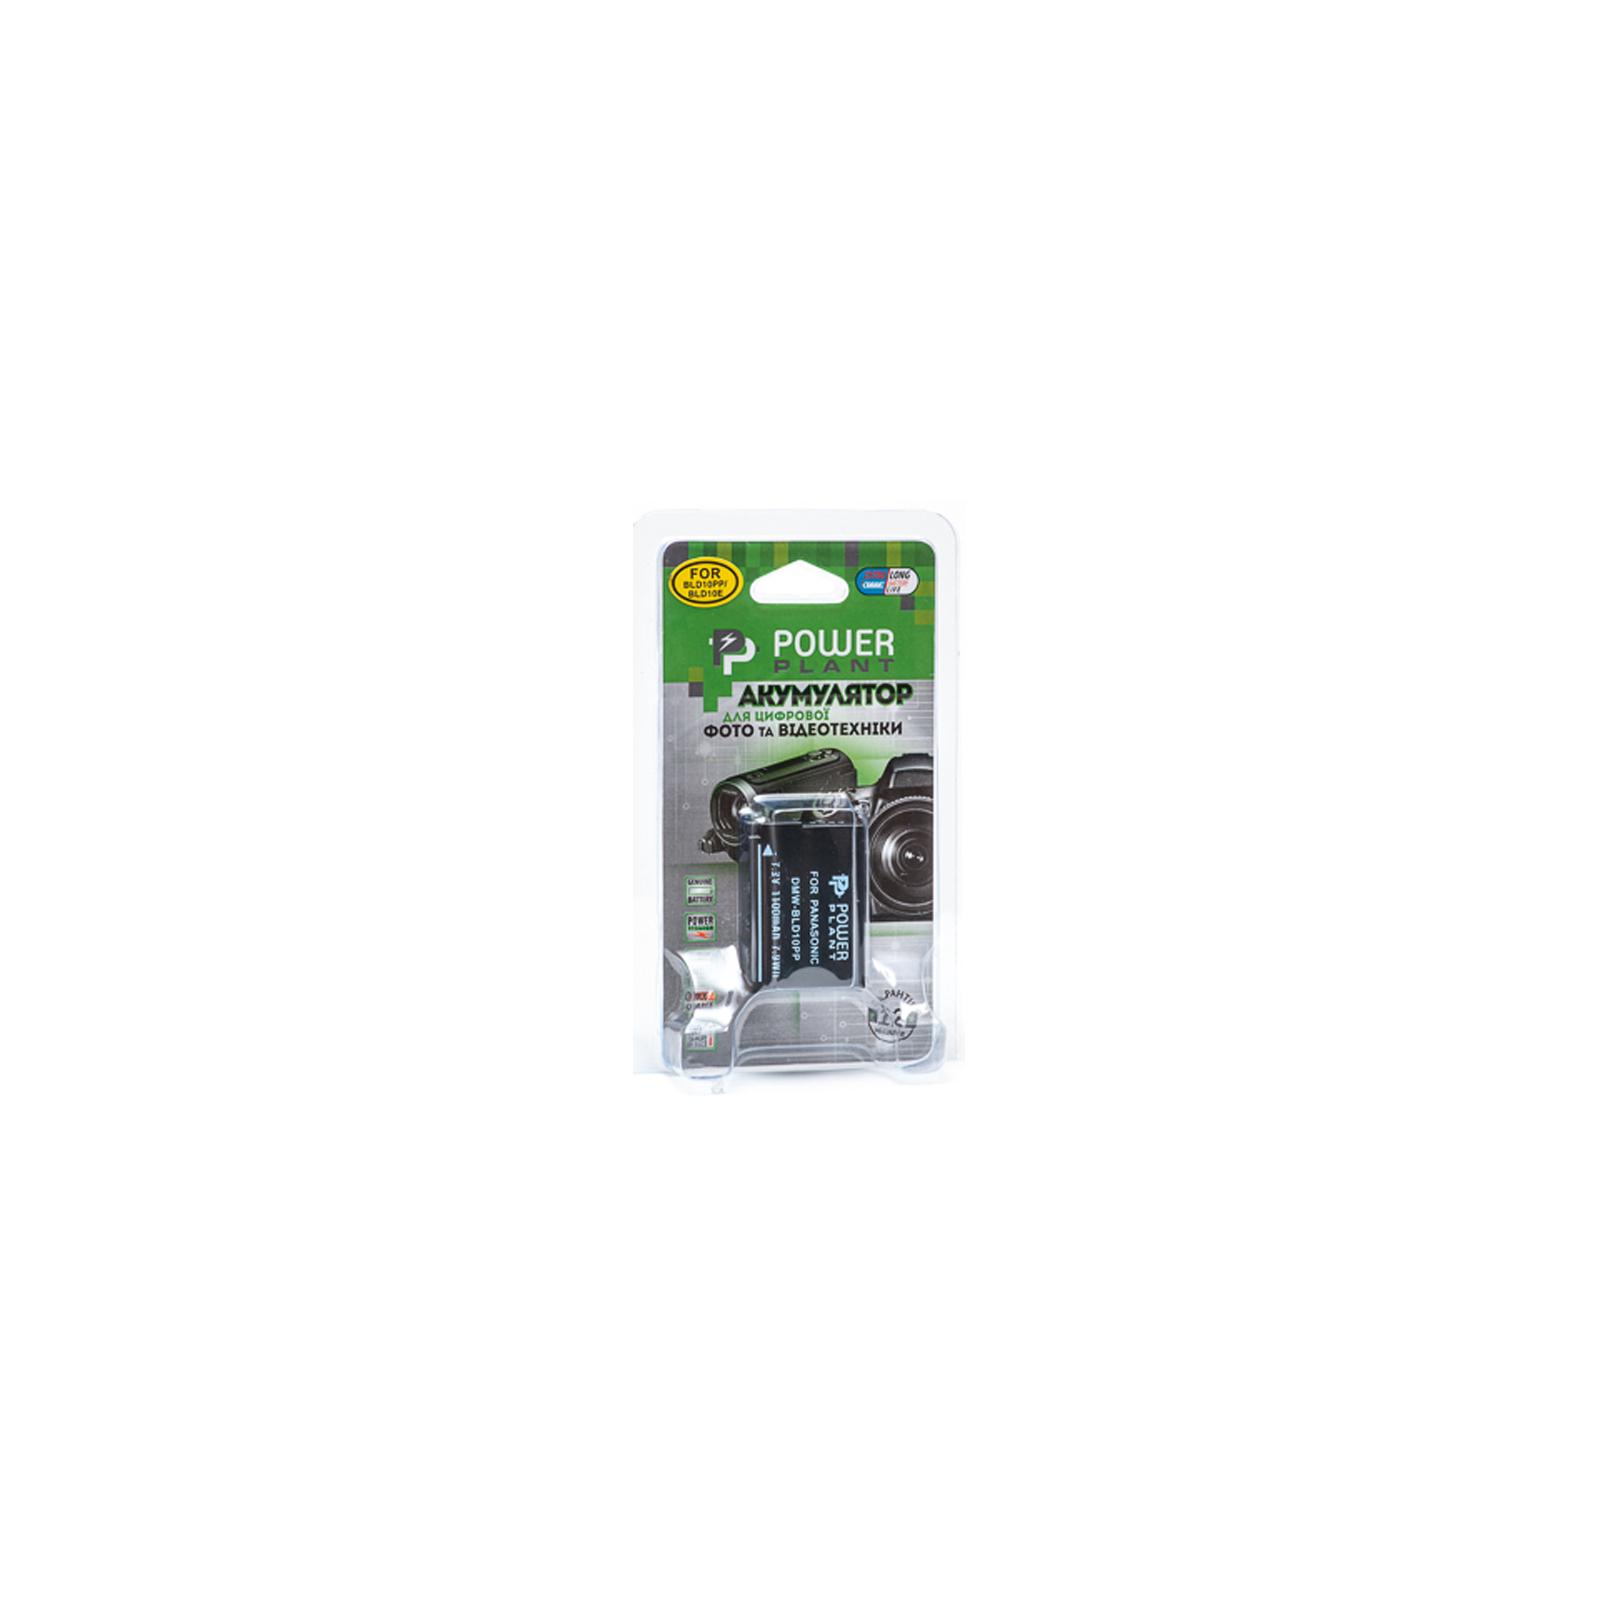 Аккумулятор к фото/видео PowerPlant Panasonic DMW-BLD10PP (DV00DV1298) изображение 3